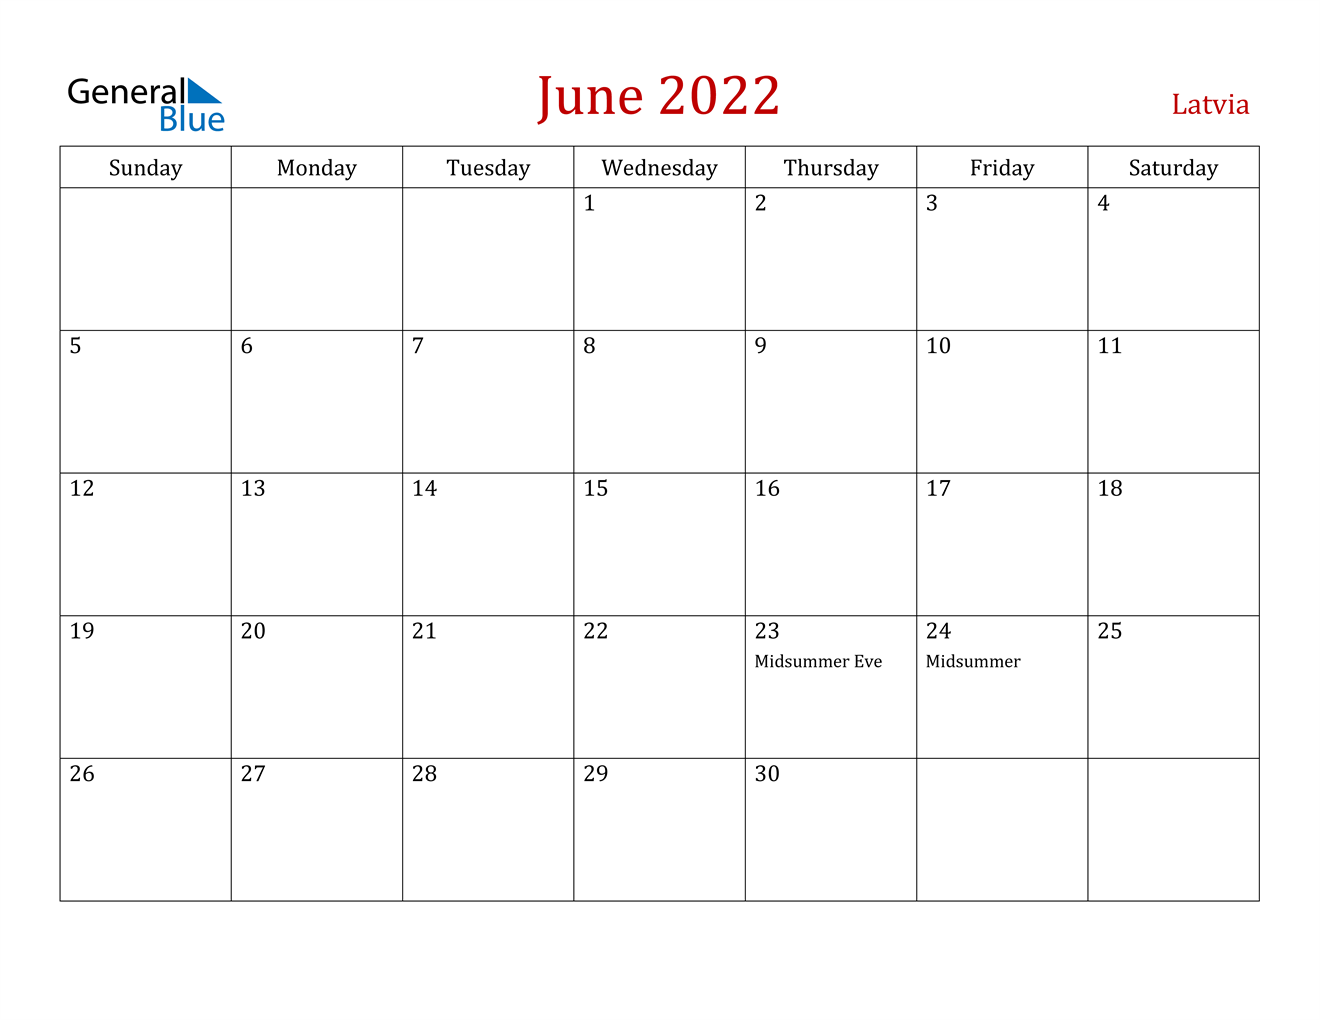 June 2022 Calendar - Latvia